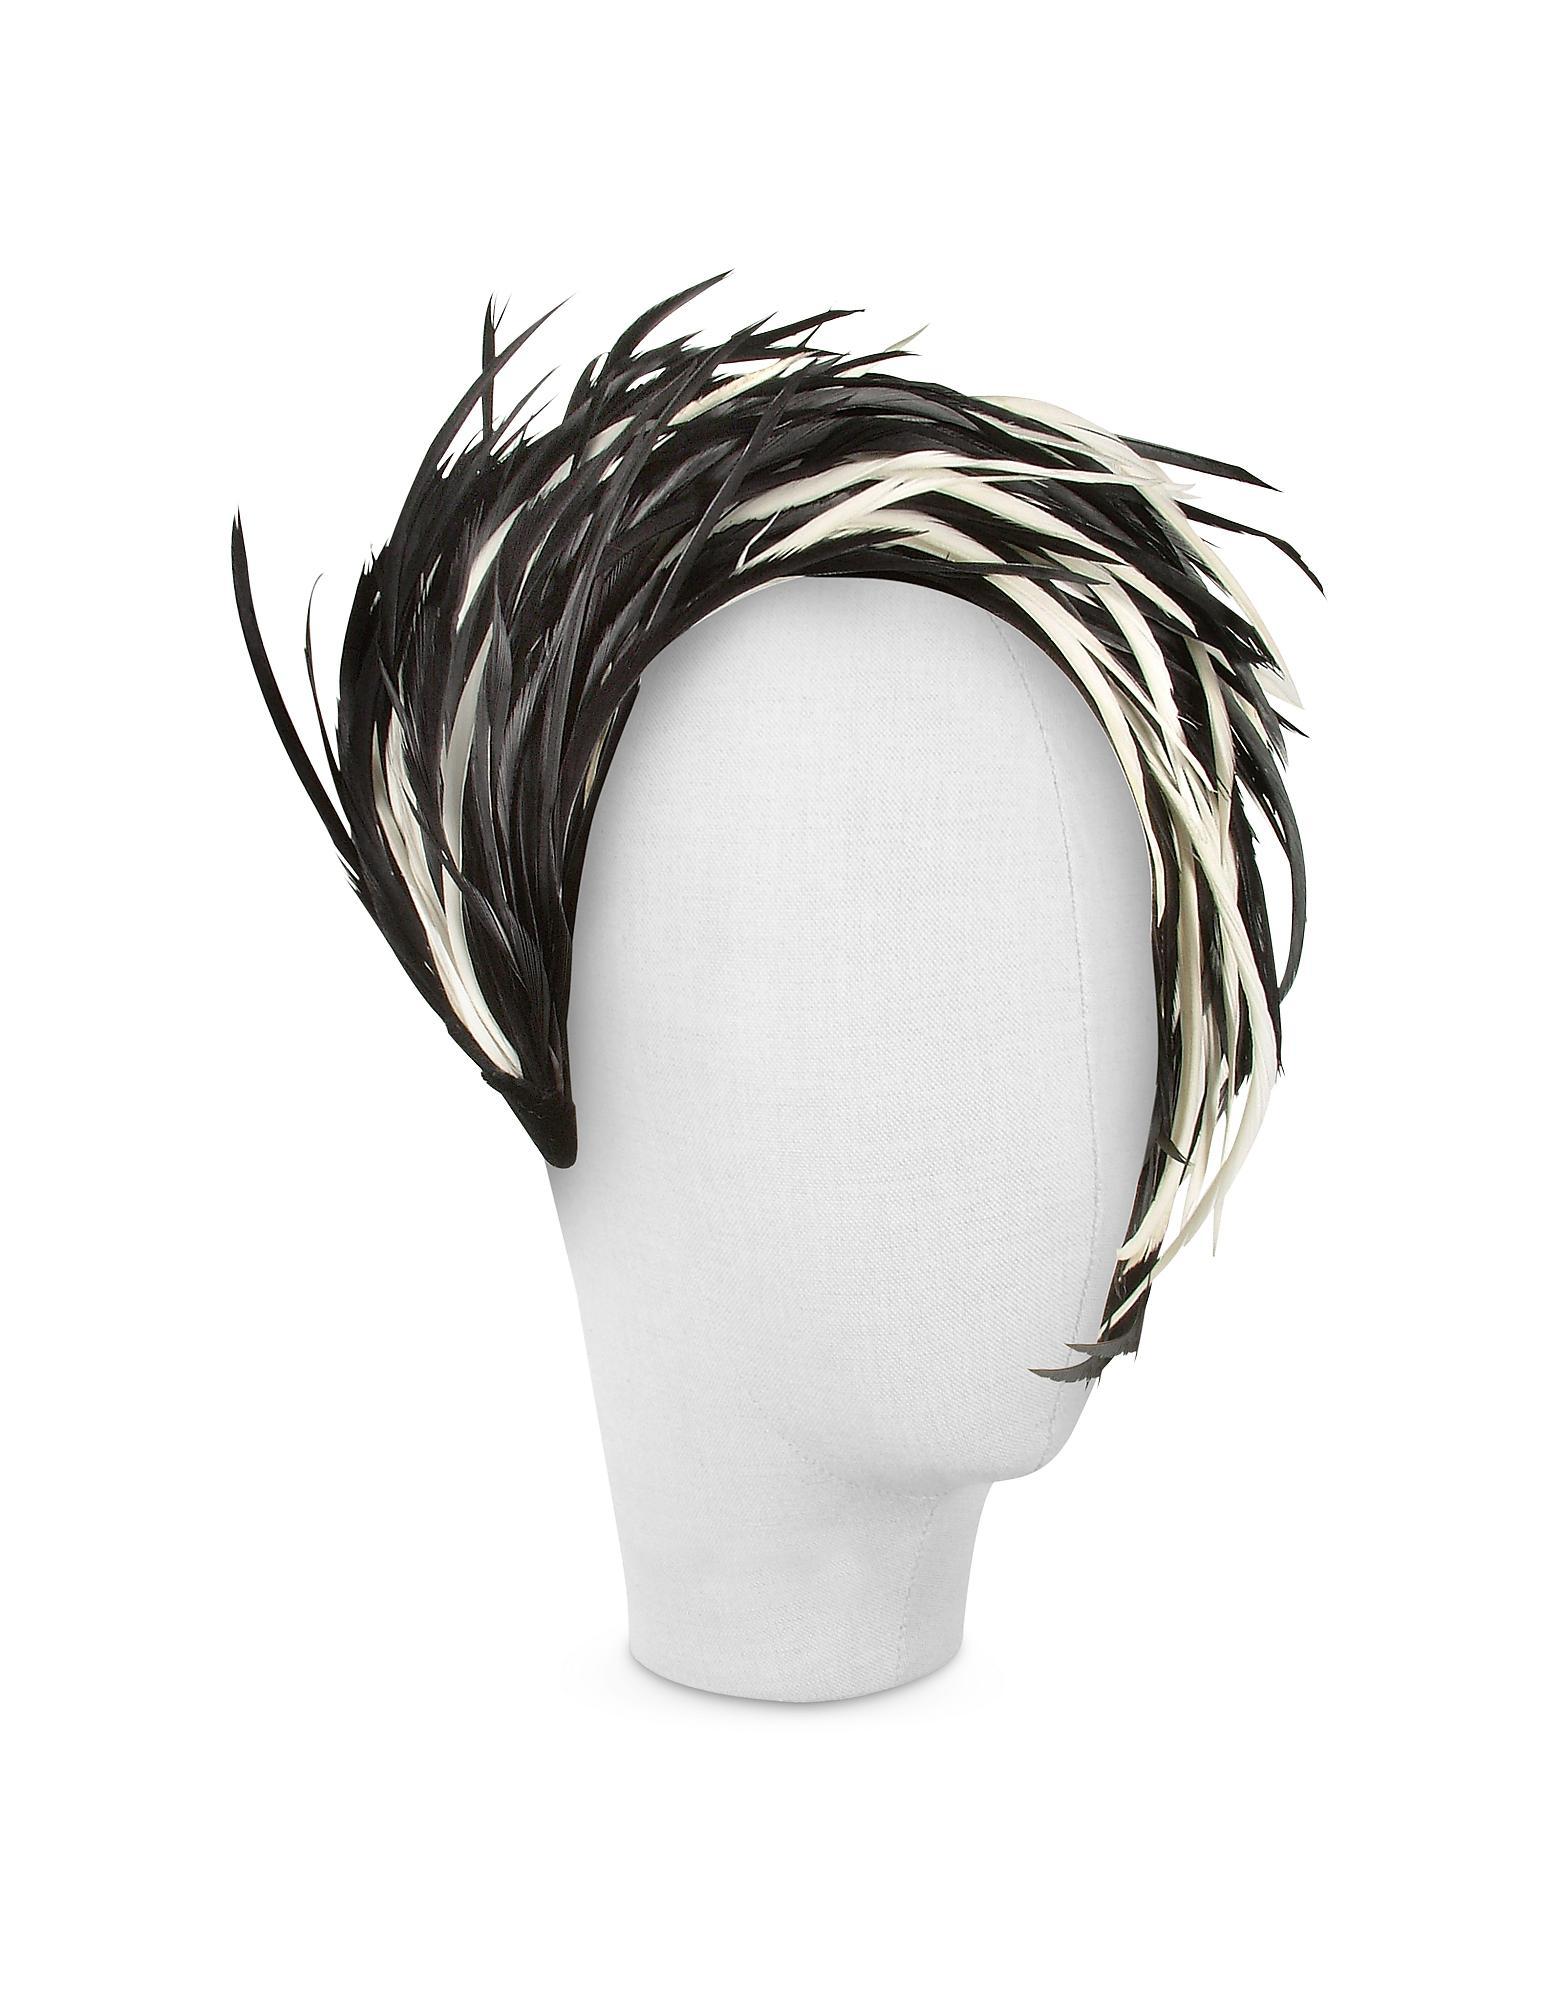 6d6918ba150 Nana  Aurora - Black And White Feather Headband in Black - Save  36.29160063391442% - Lyst